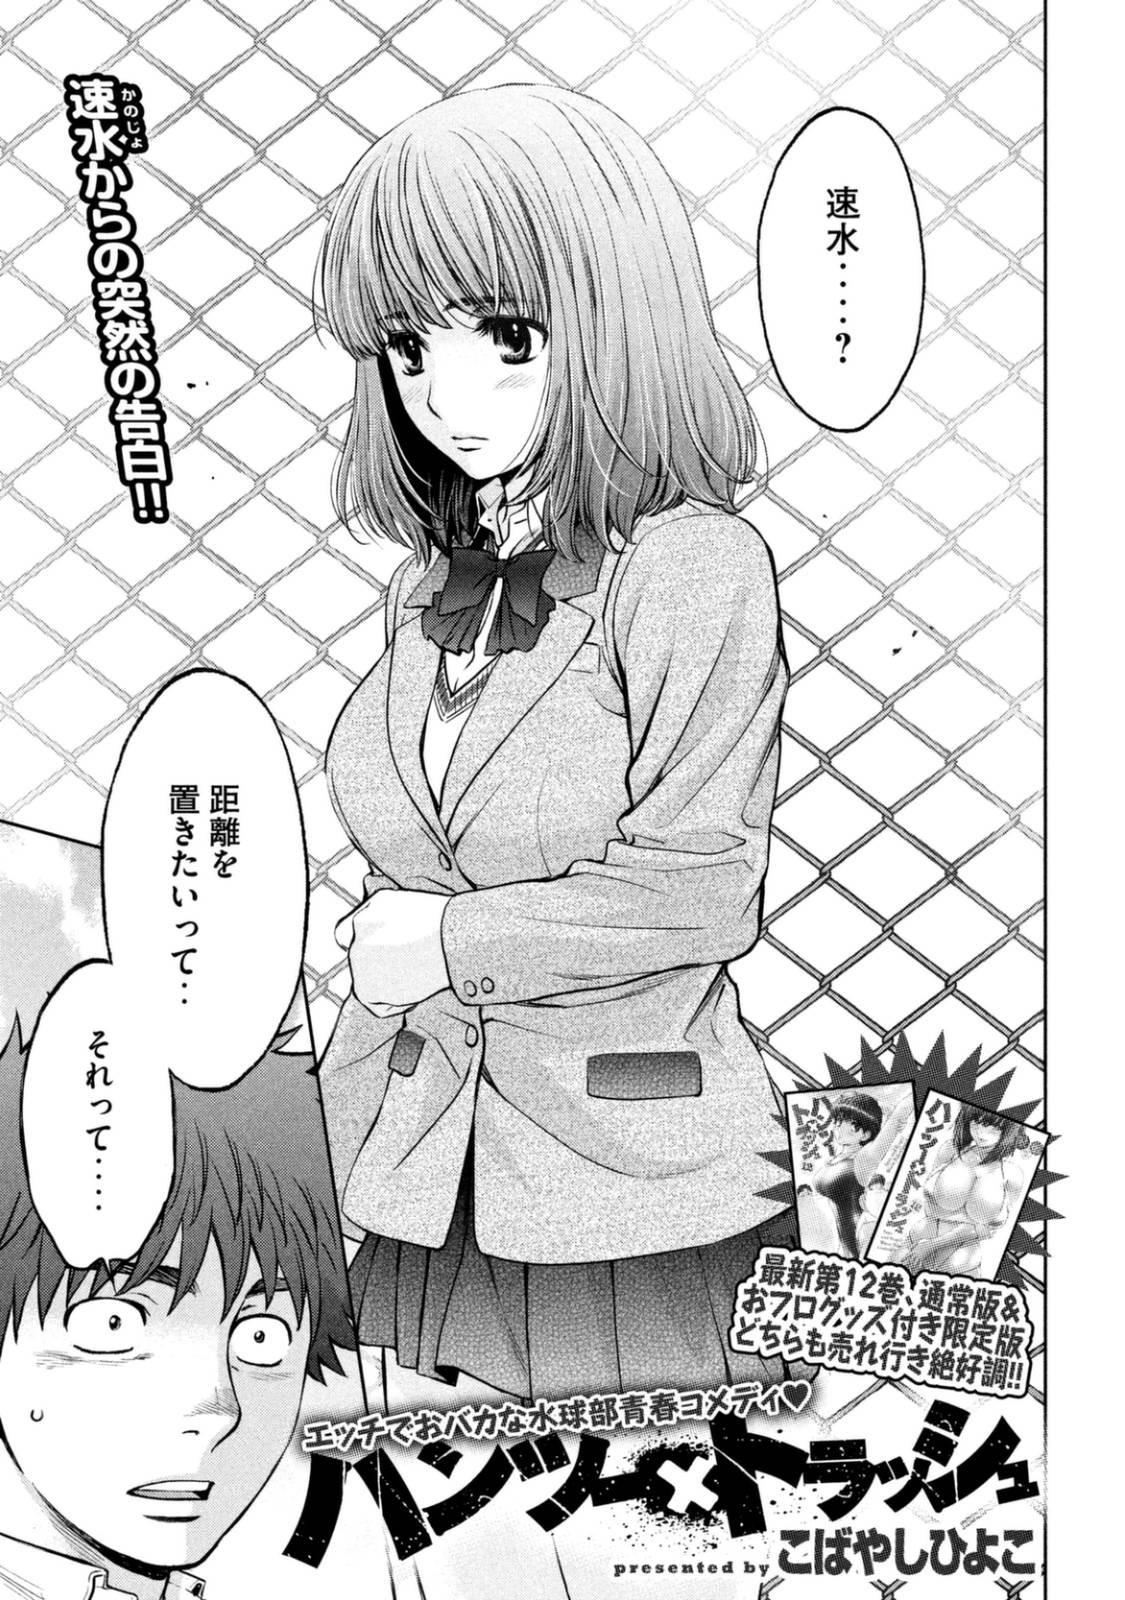 Hantsu_x_Trash Chapter 150 Page 1